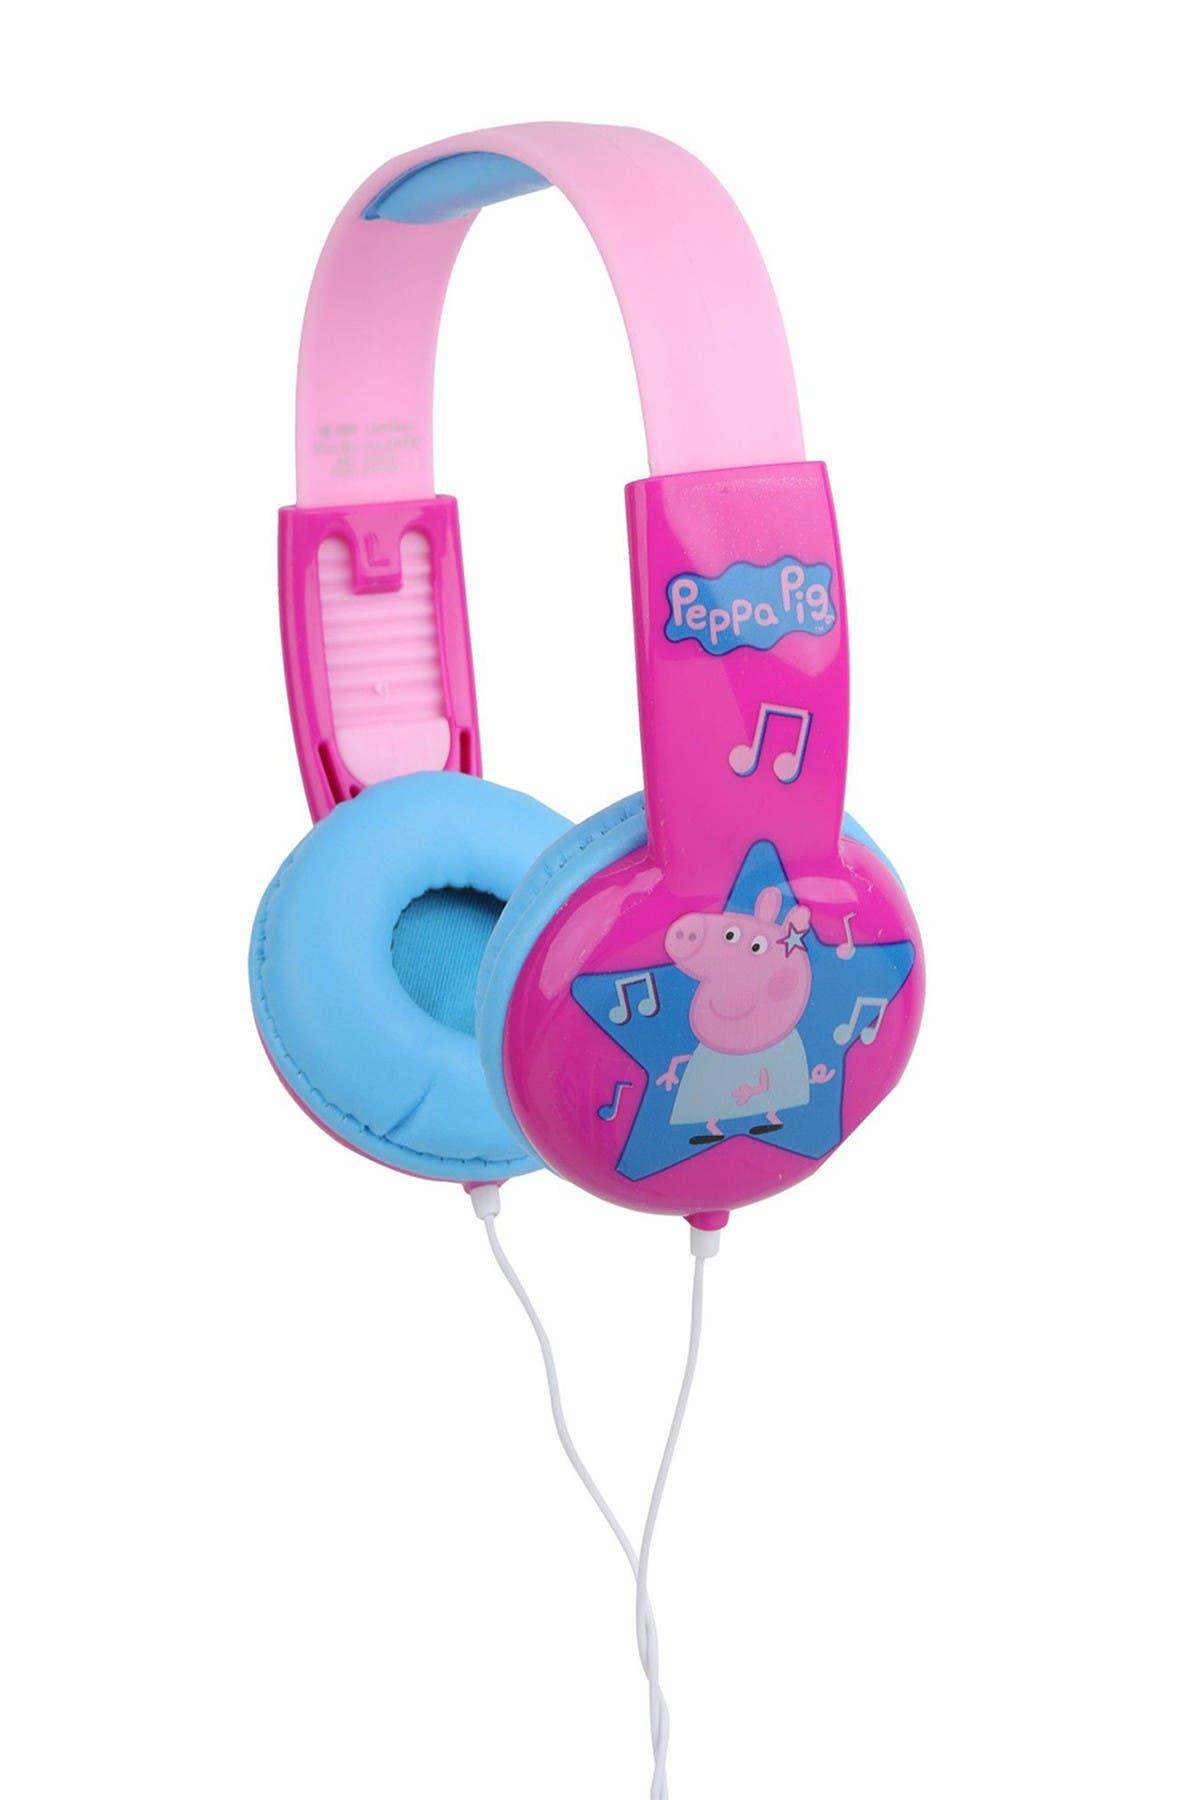 Image of VIVITAR Peppa Pig Kids-Safe Headphones